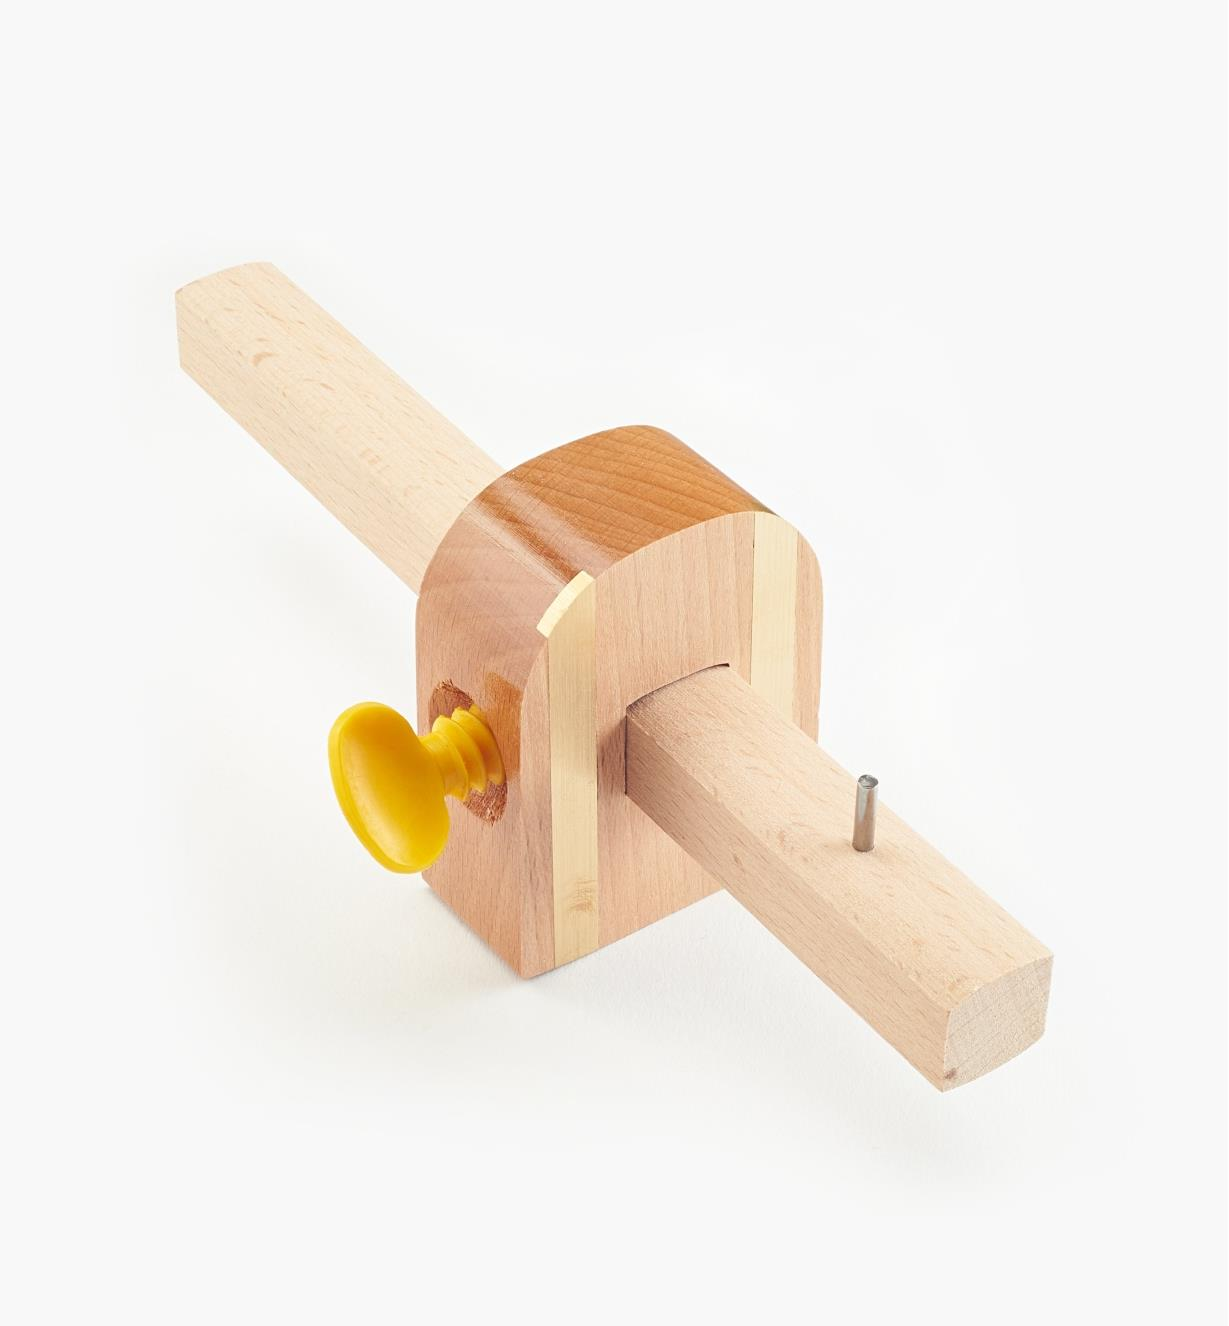 35N0605 - Beech Marking Gauge